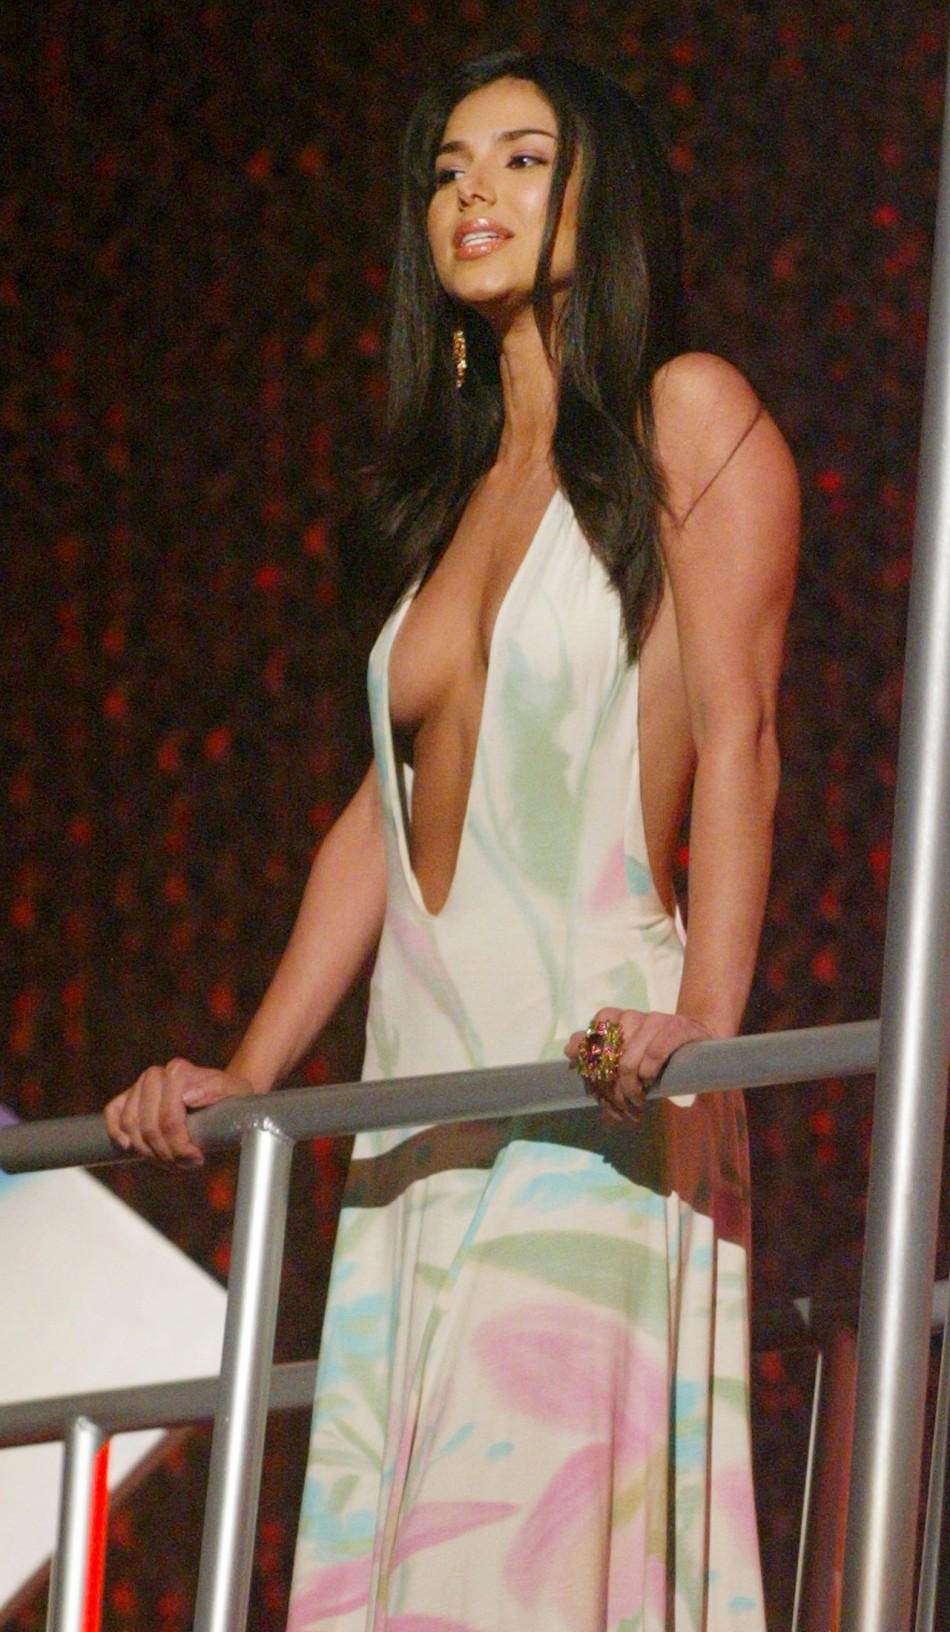 Actress Rosalyn Sanchez, star of the film